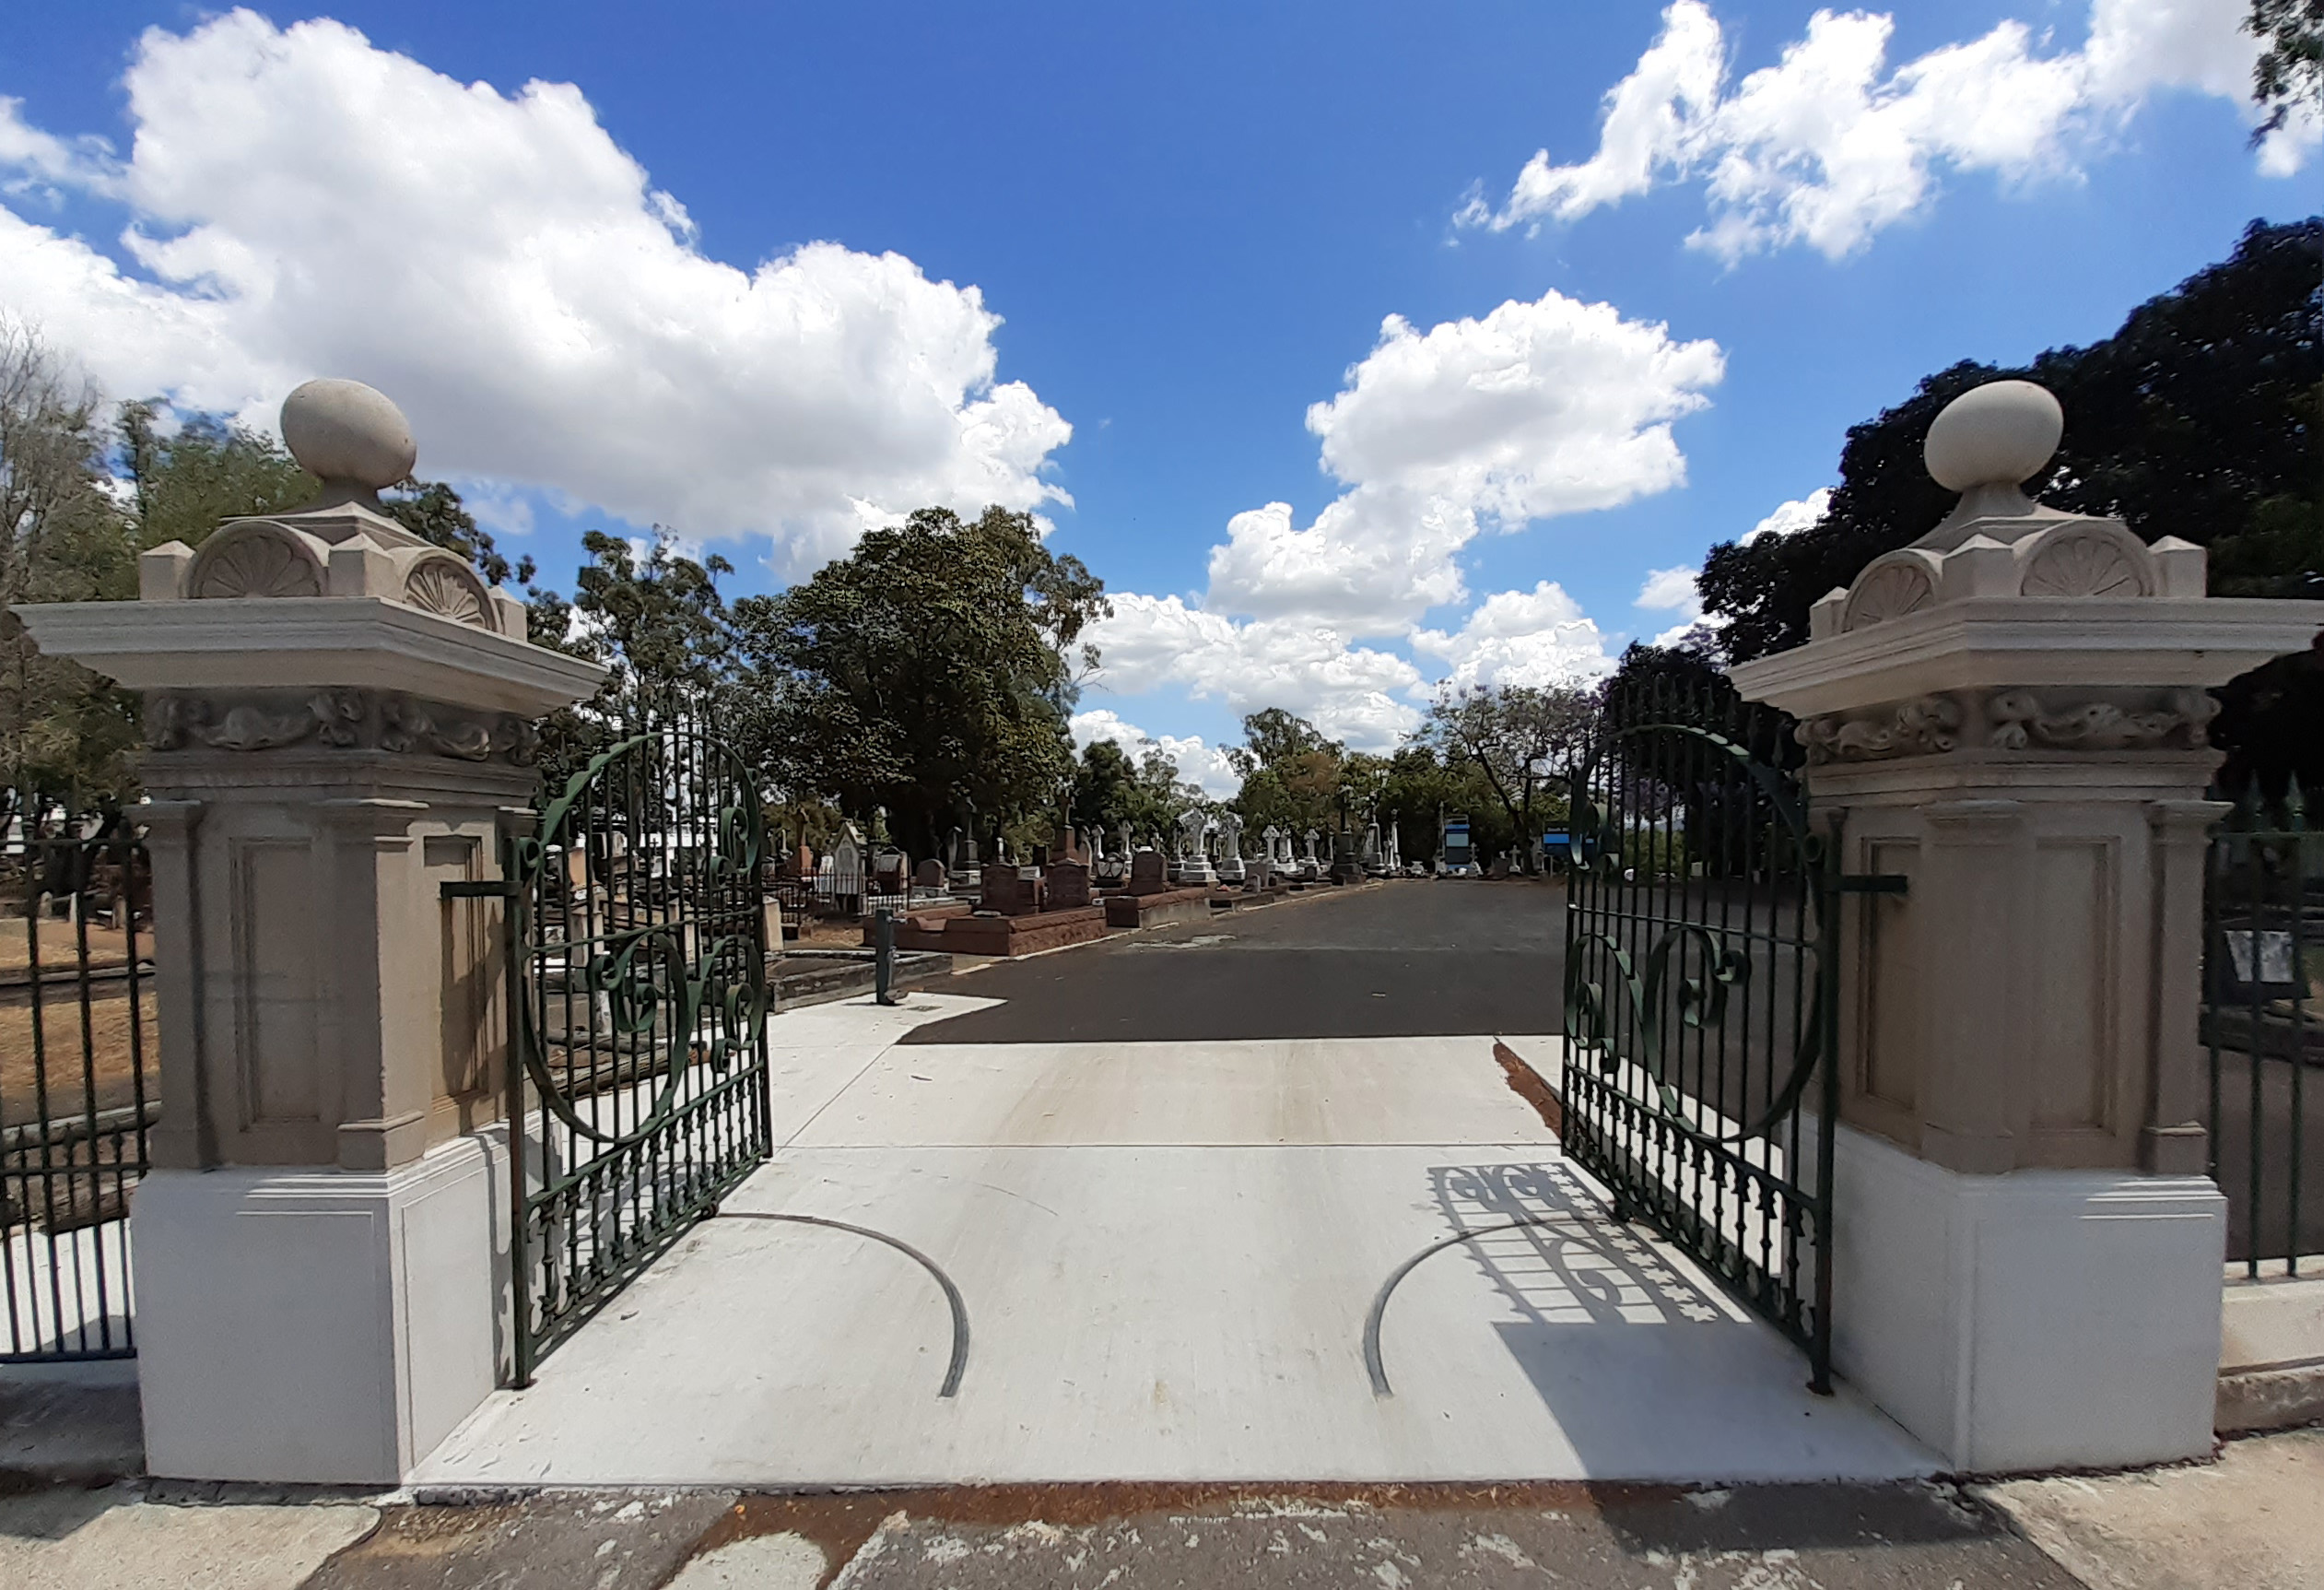 SB Cemetery gates